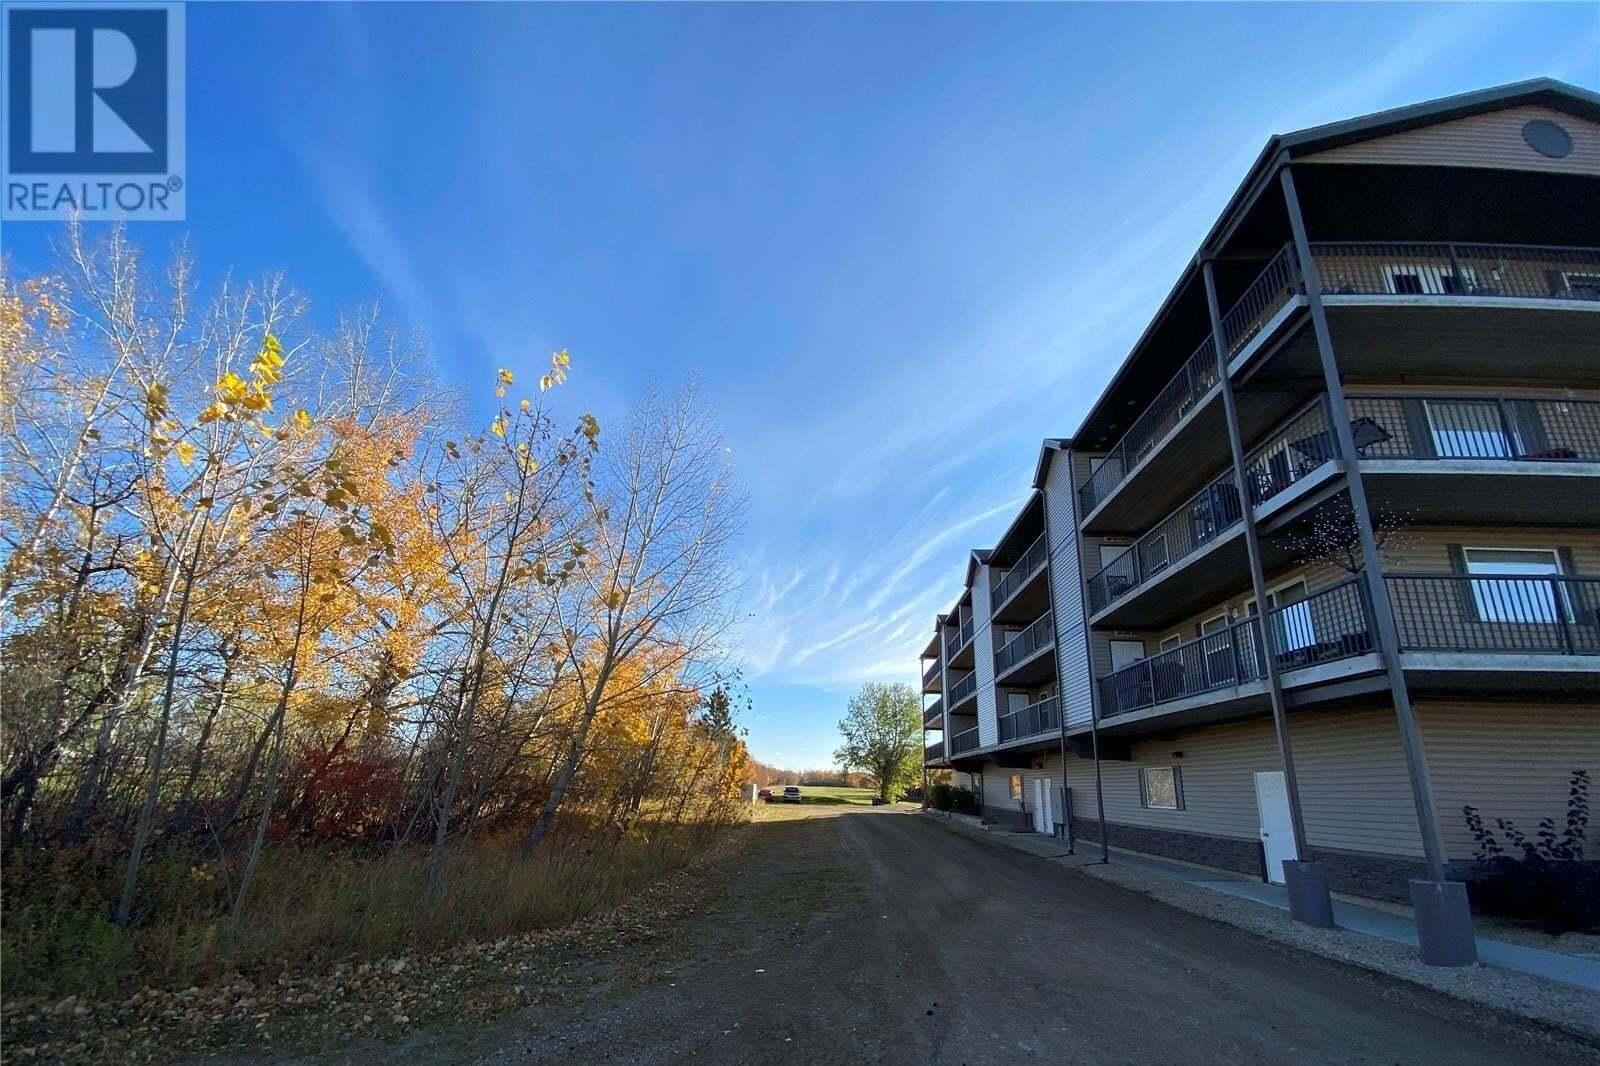 Condo for sale at 1140 Main St Unit 206 Humboldt Saskatchewan - MLS: SK829000